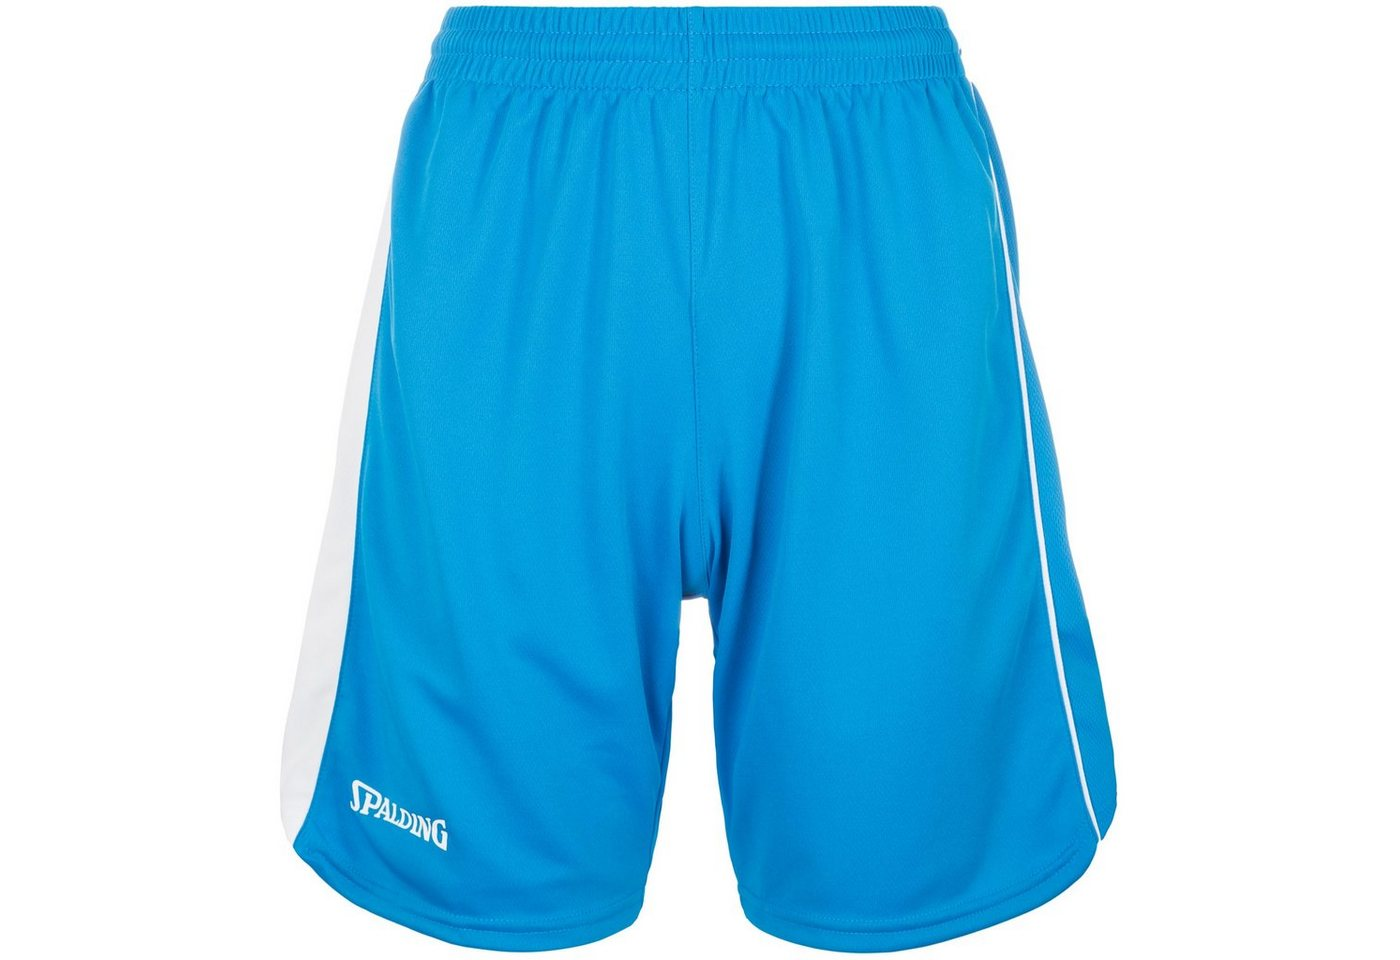 Spalding 4her II Basketballshort Damen   Sportbekleidung > Sporthosen > Basketballshorts   Blau   Polyester   Spalding